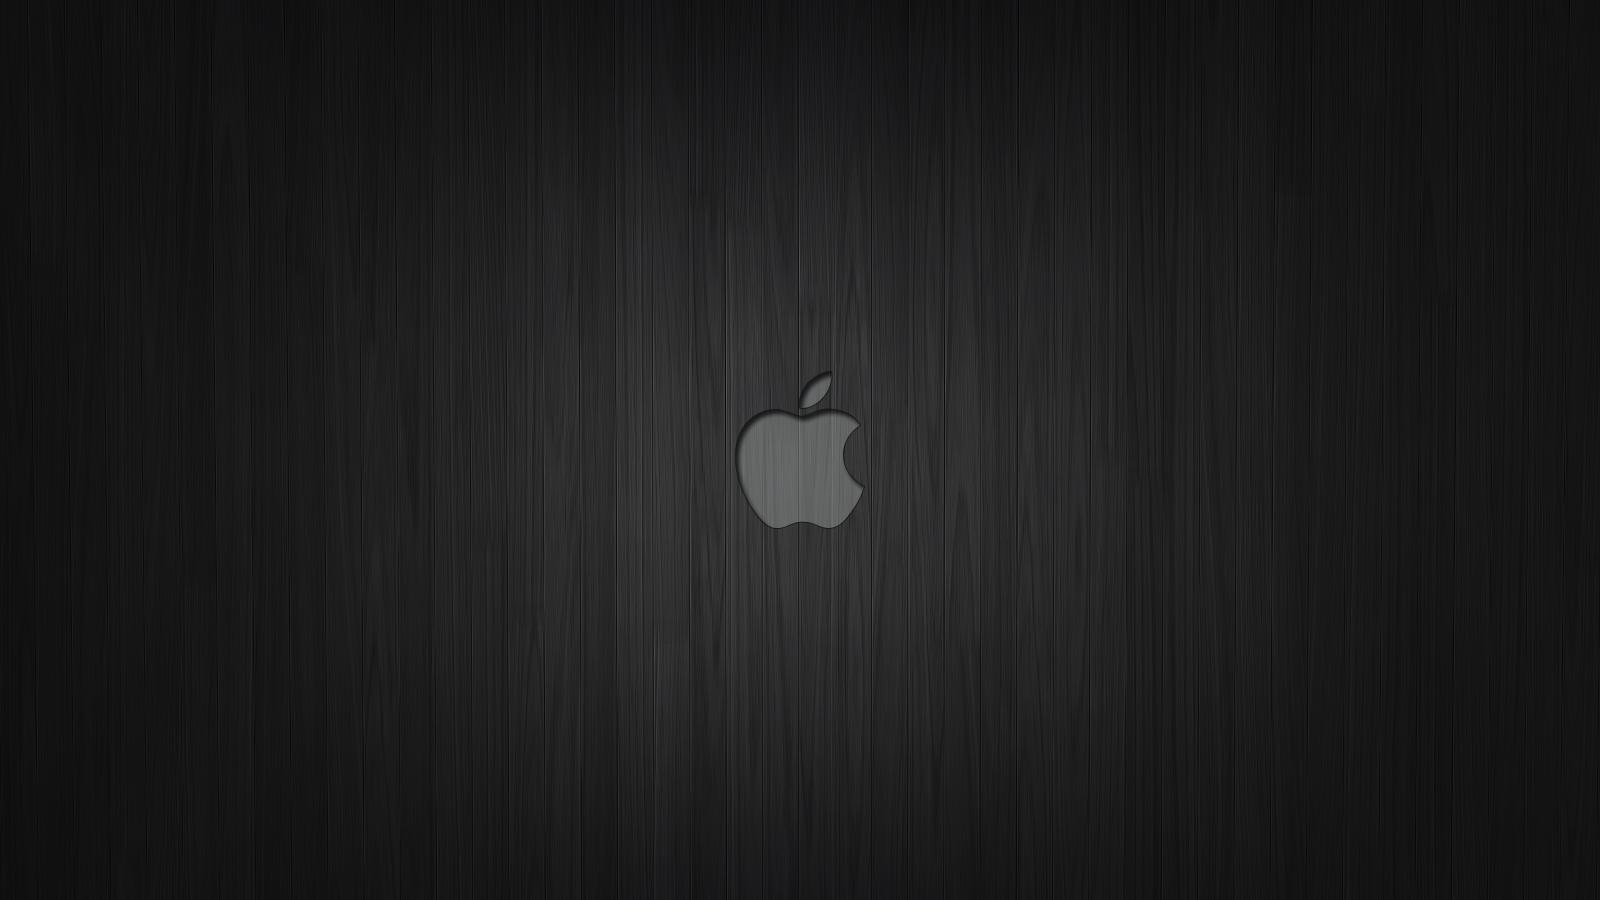 Apple dark wood wallpaper by bercikmeister on deviantart - Dark wood wallpaper ...